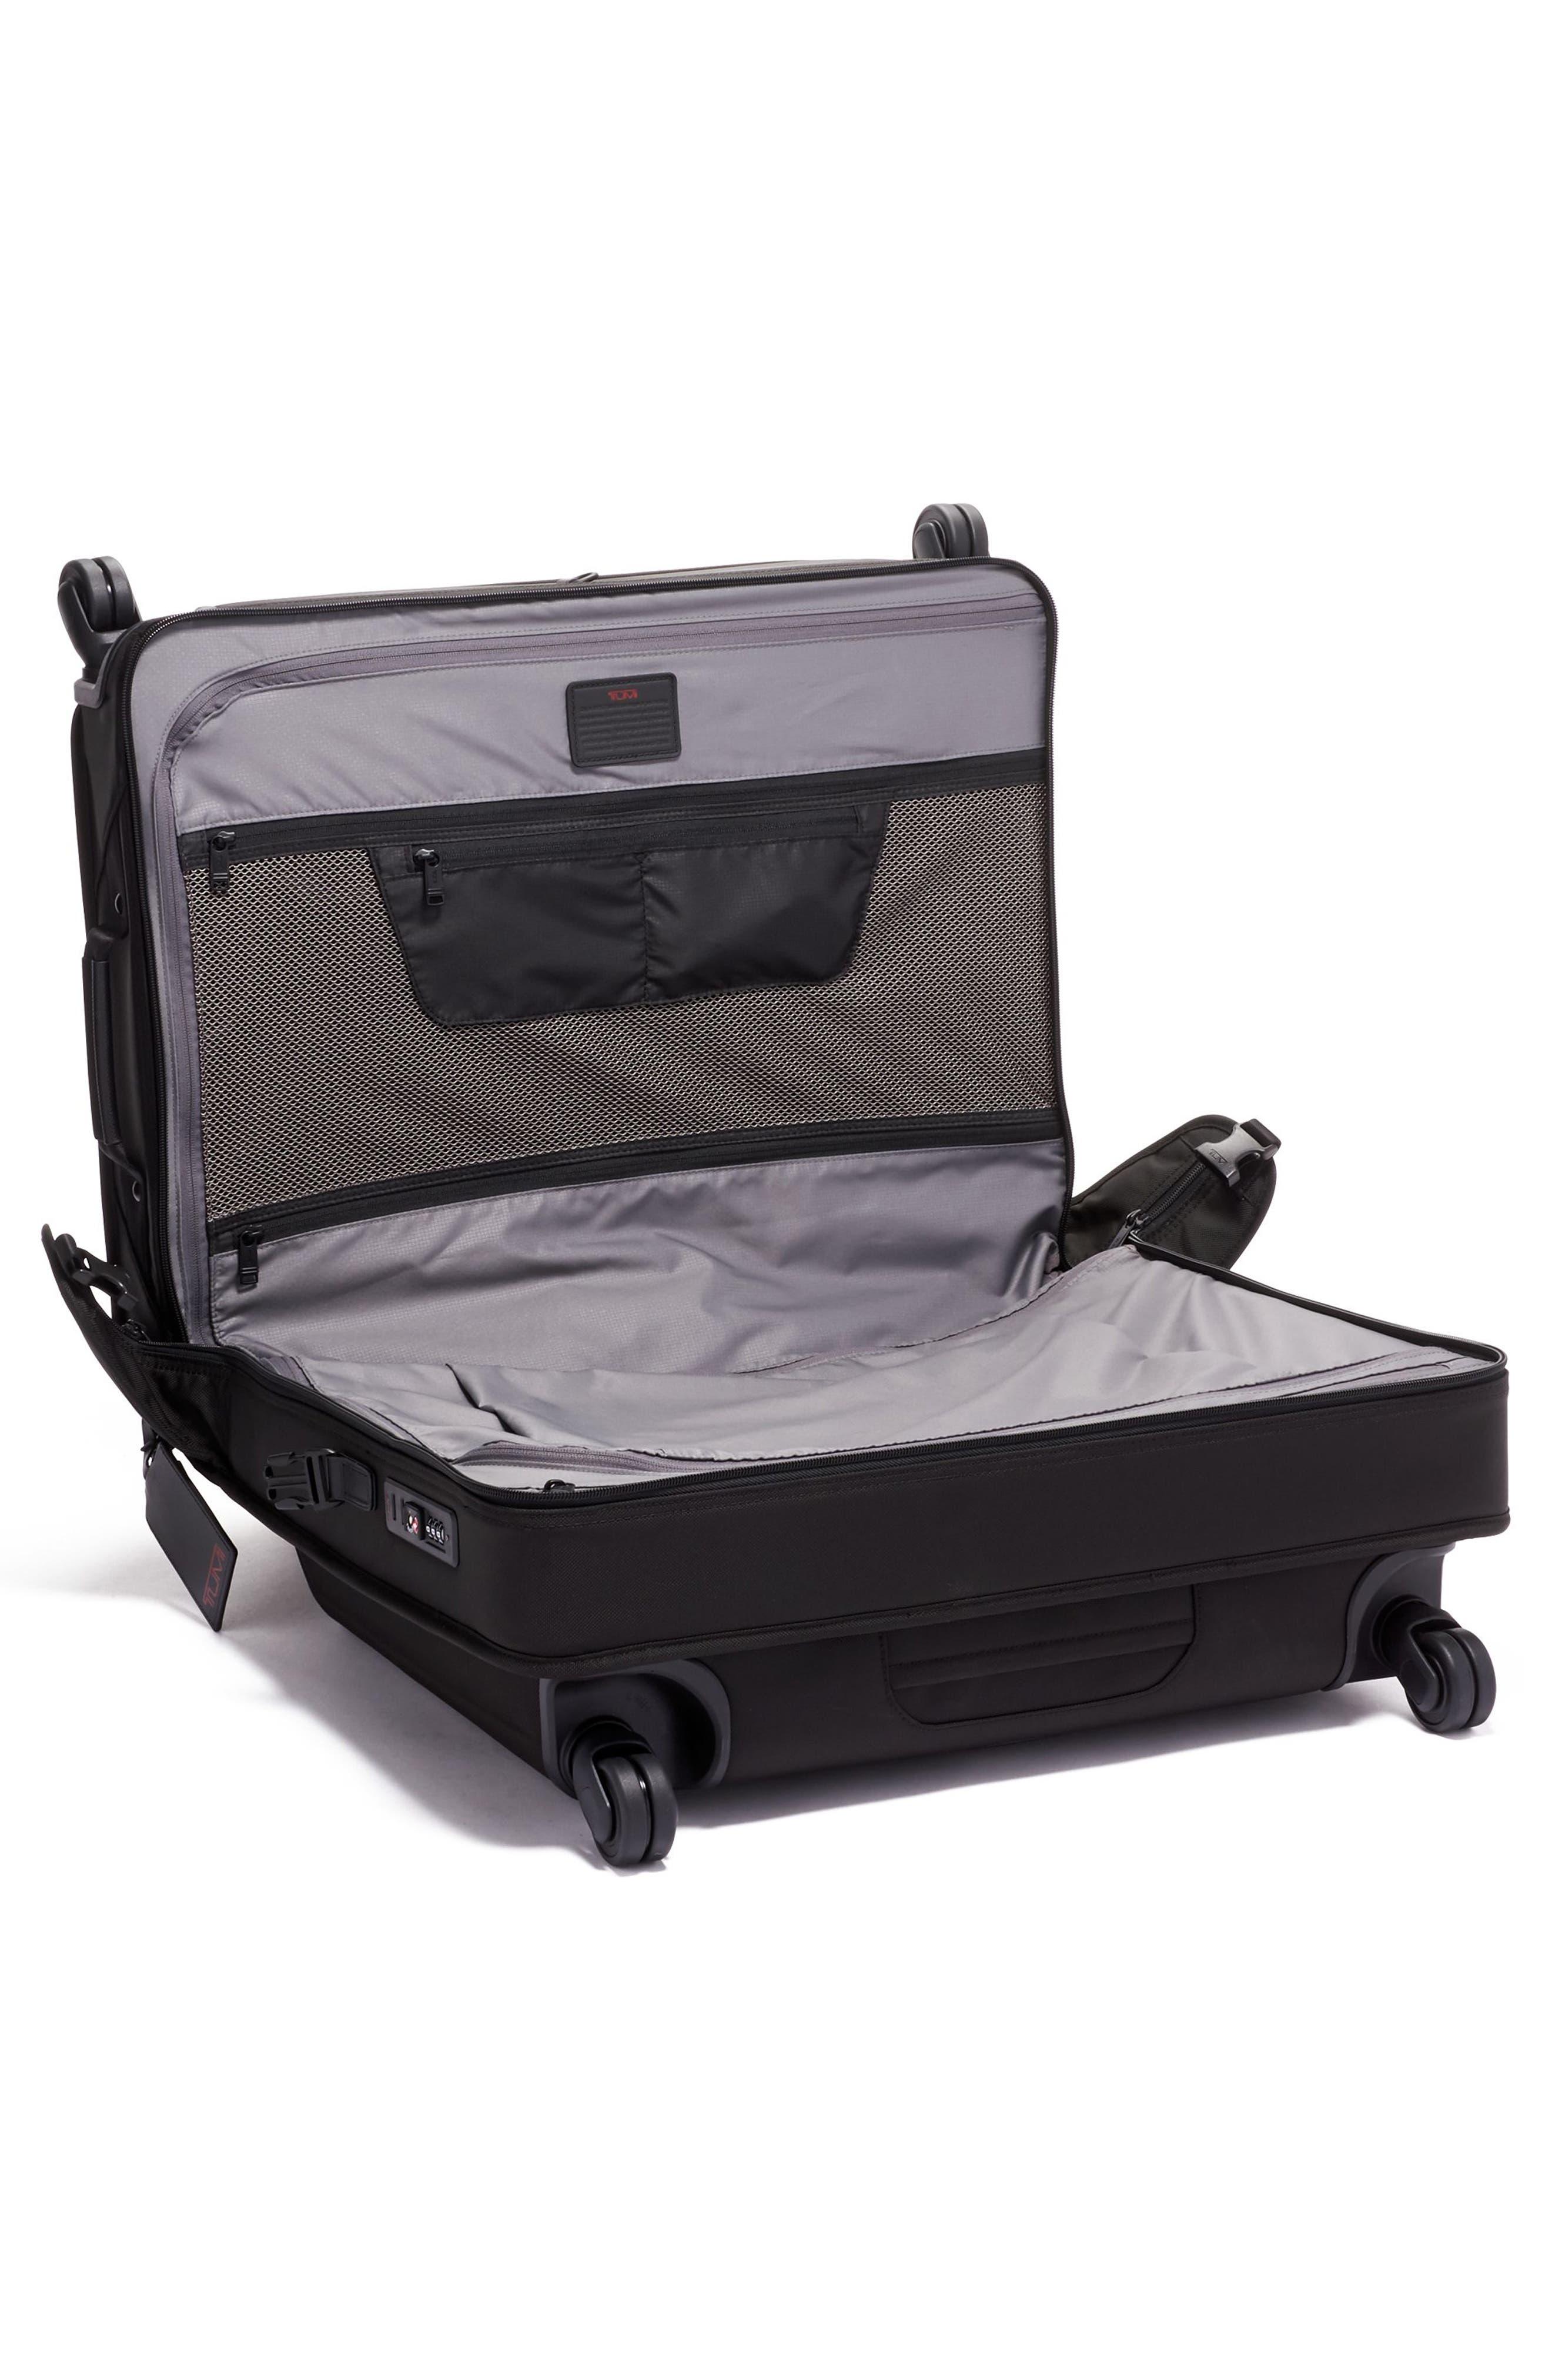 daaf50a1fe1d Boxford Travel Bag Xl | The Shred Centre